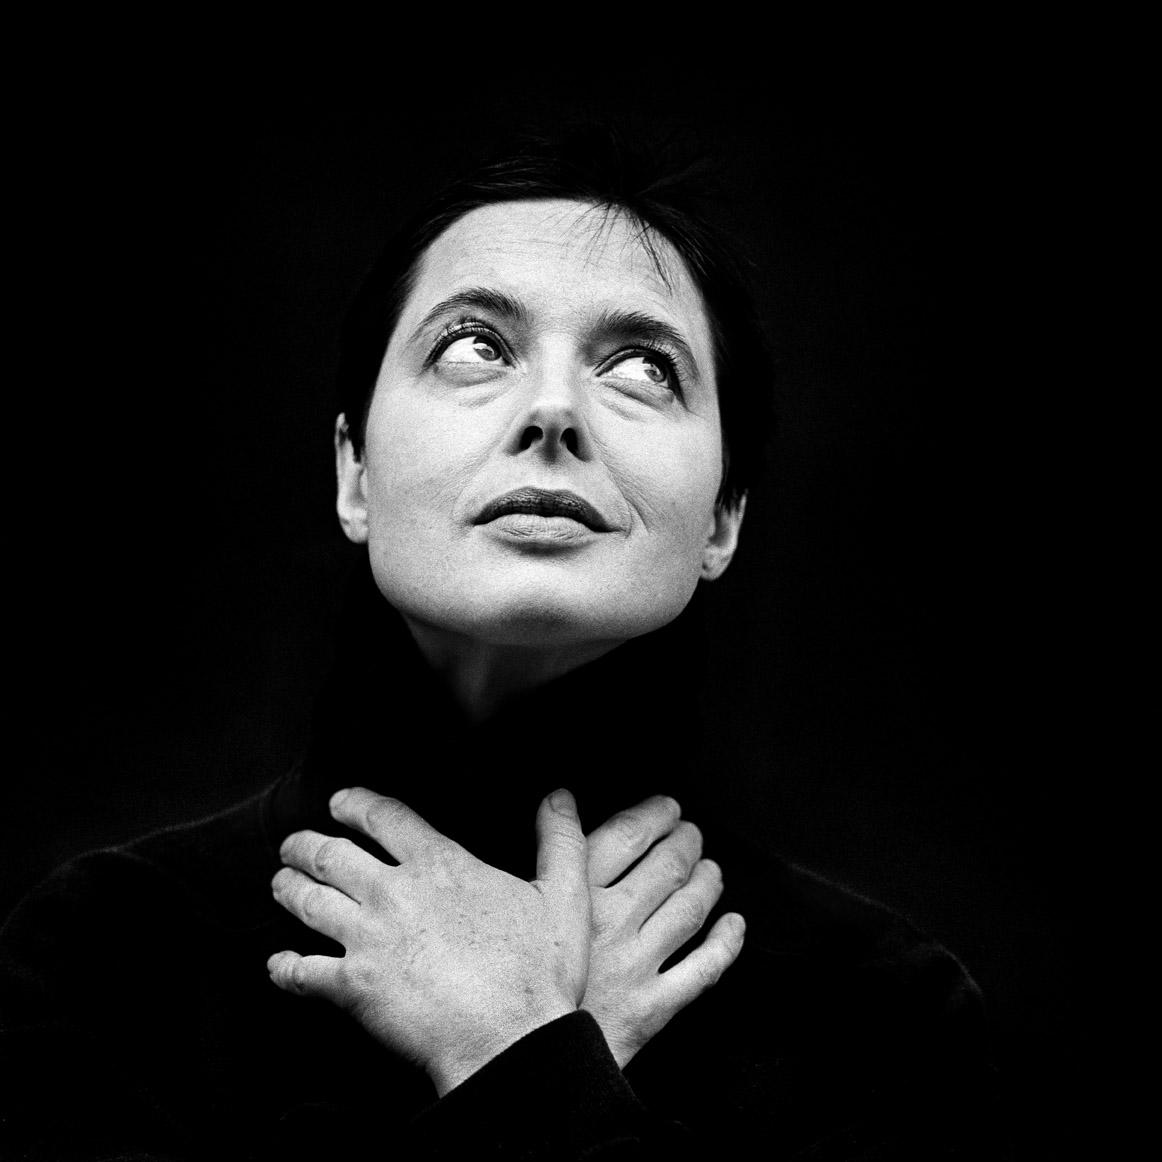 zwartwit portret van Isabella Rosselini